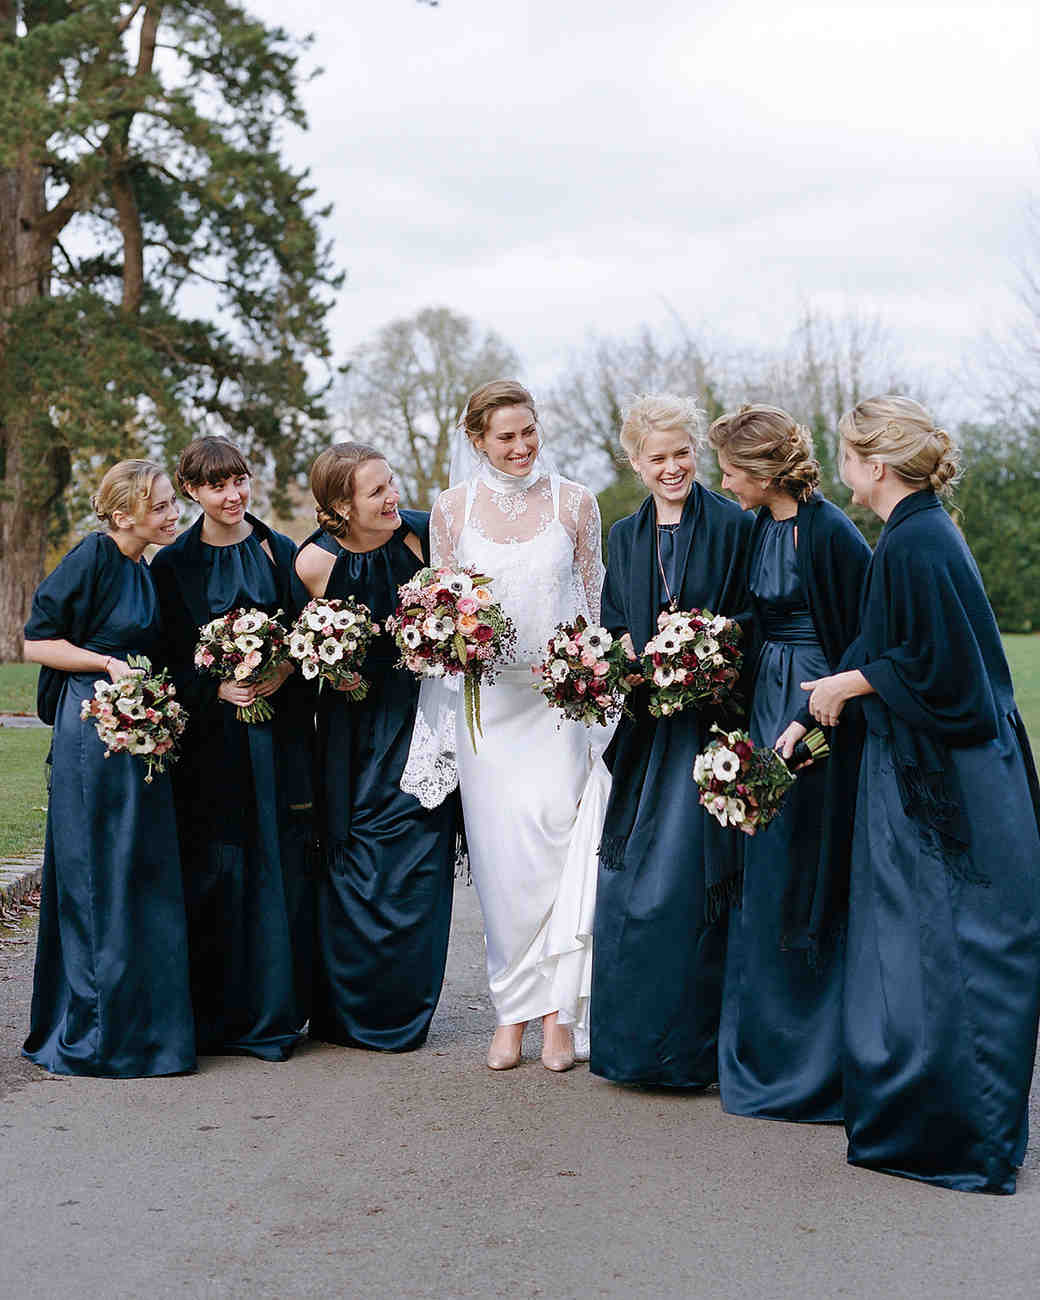 rw-heather-neal-bridesmaids-ms107641.jpg